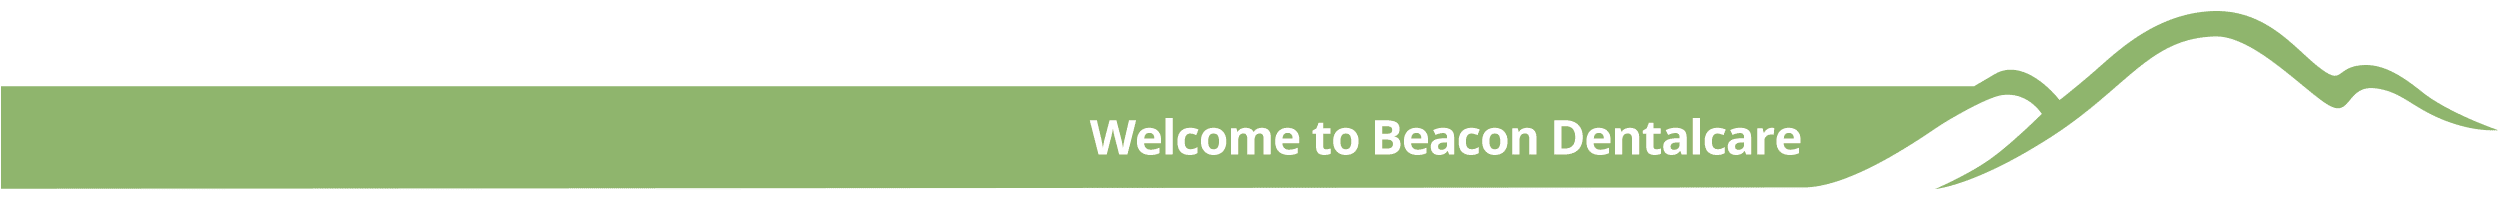 Welcome to Beacon Dentalcare